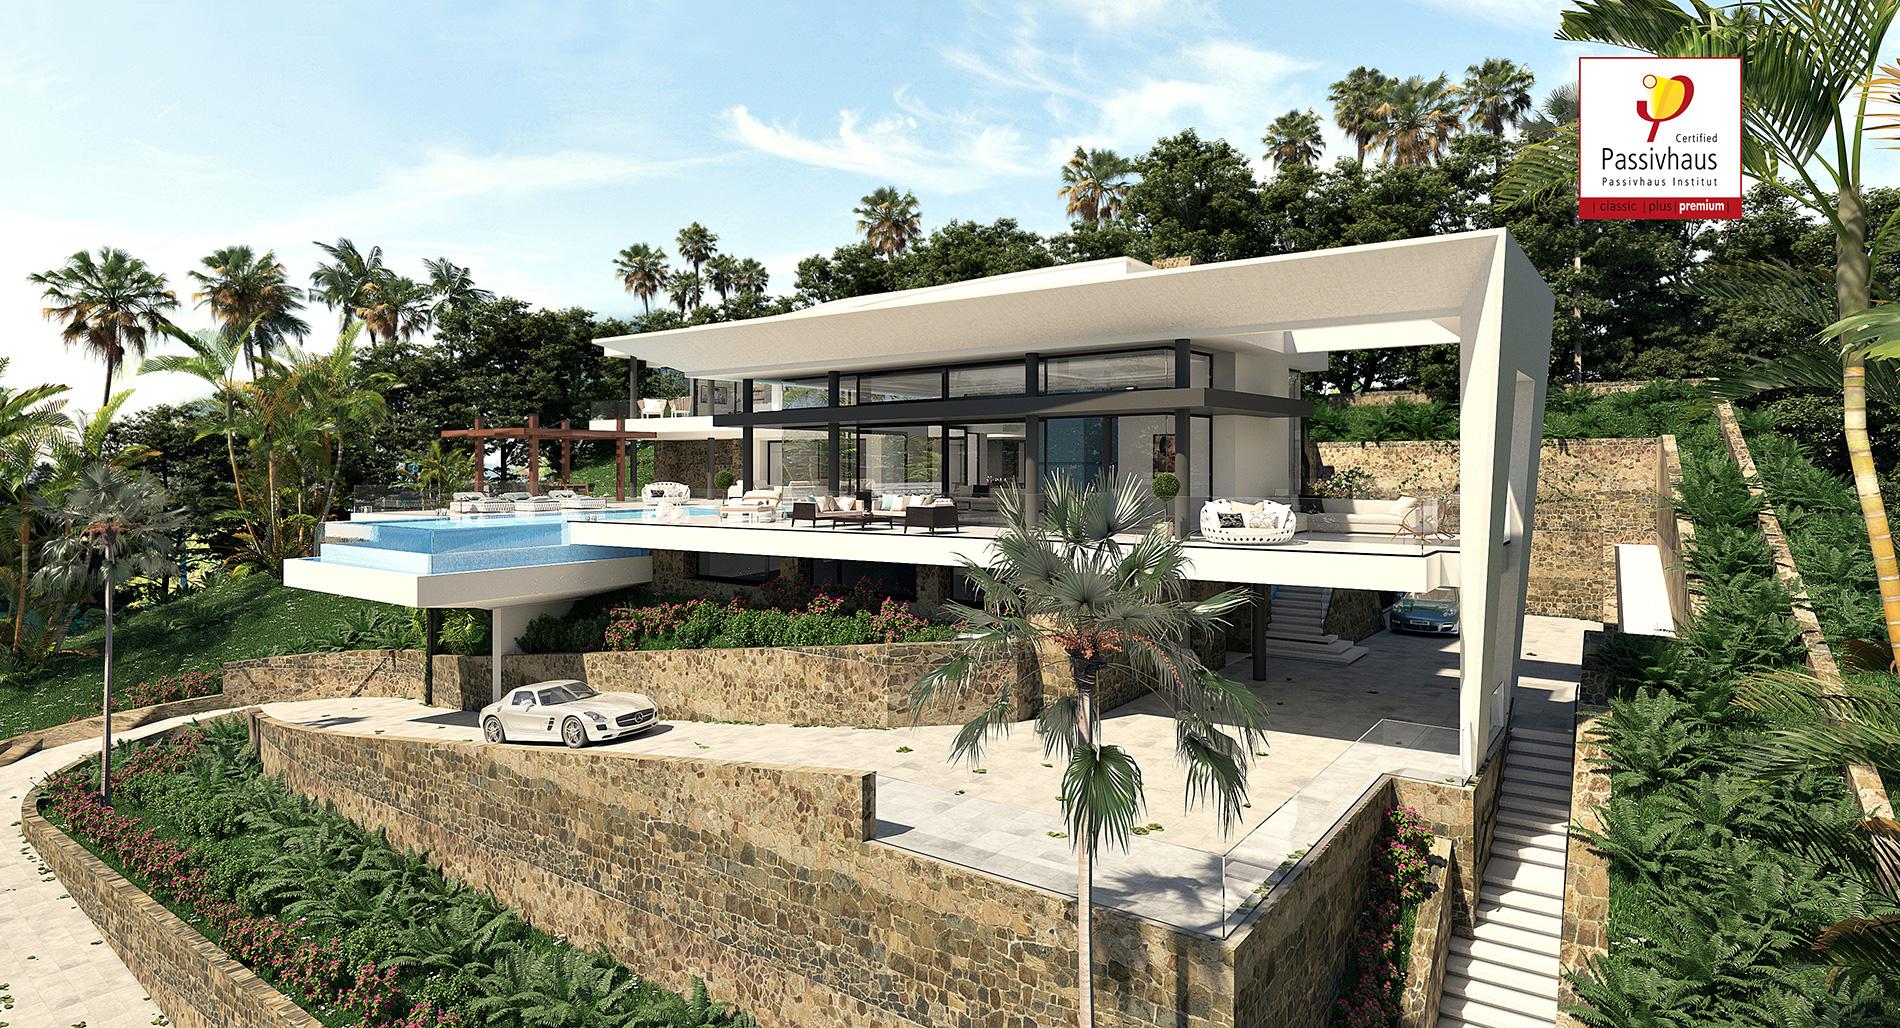 vivienda Passivhaus en la Costa del sol